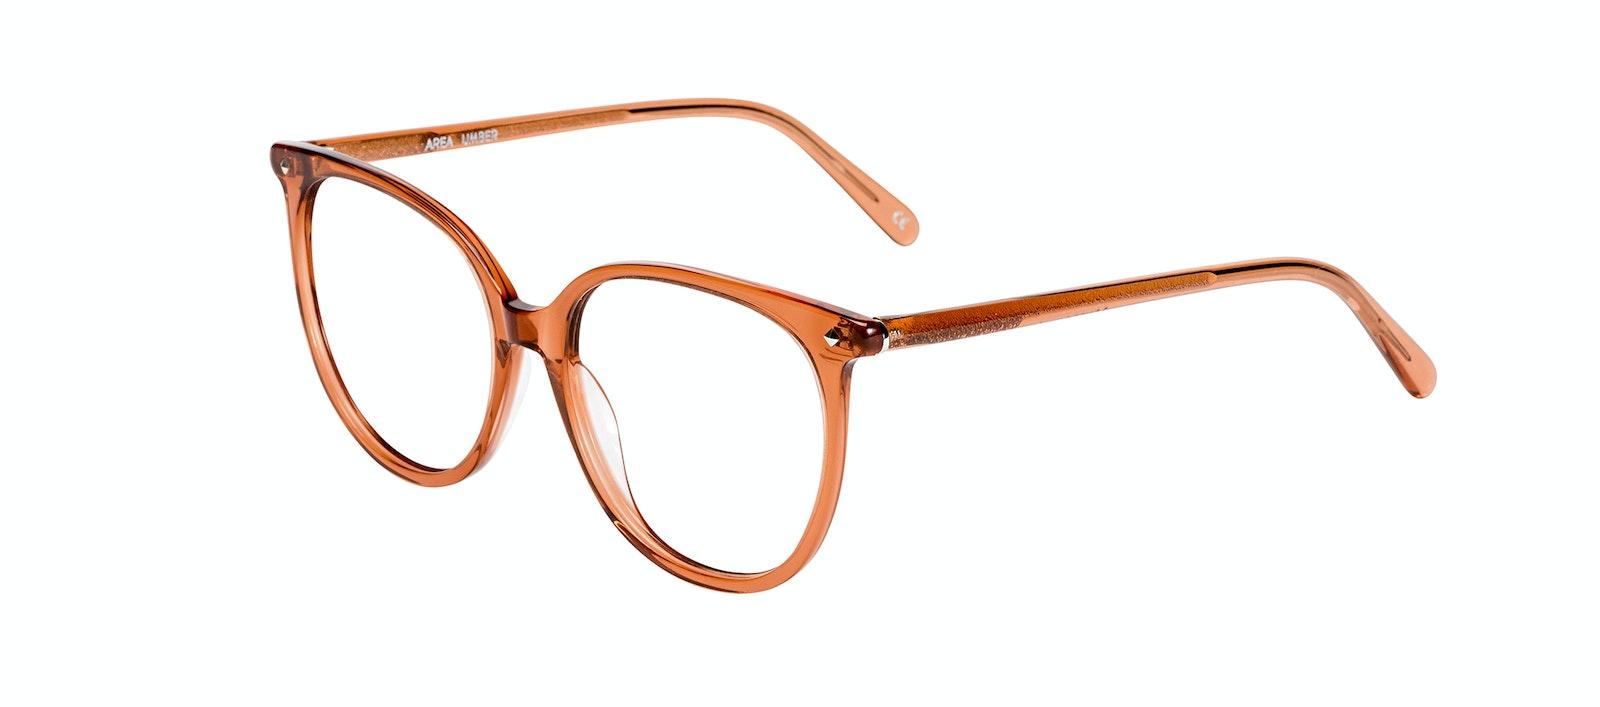 Affordable Fashion Glasses Round Eyeglasses Women Area Umber Tilt